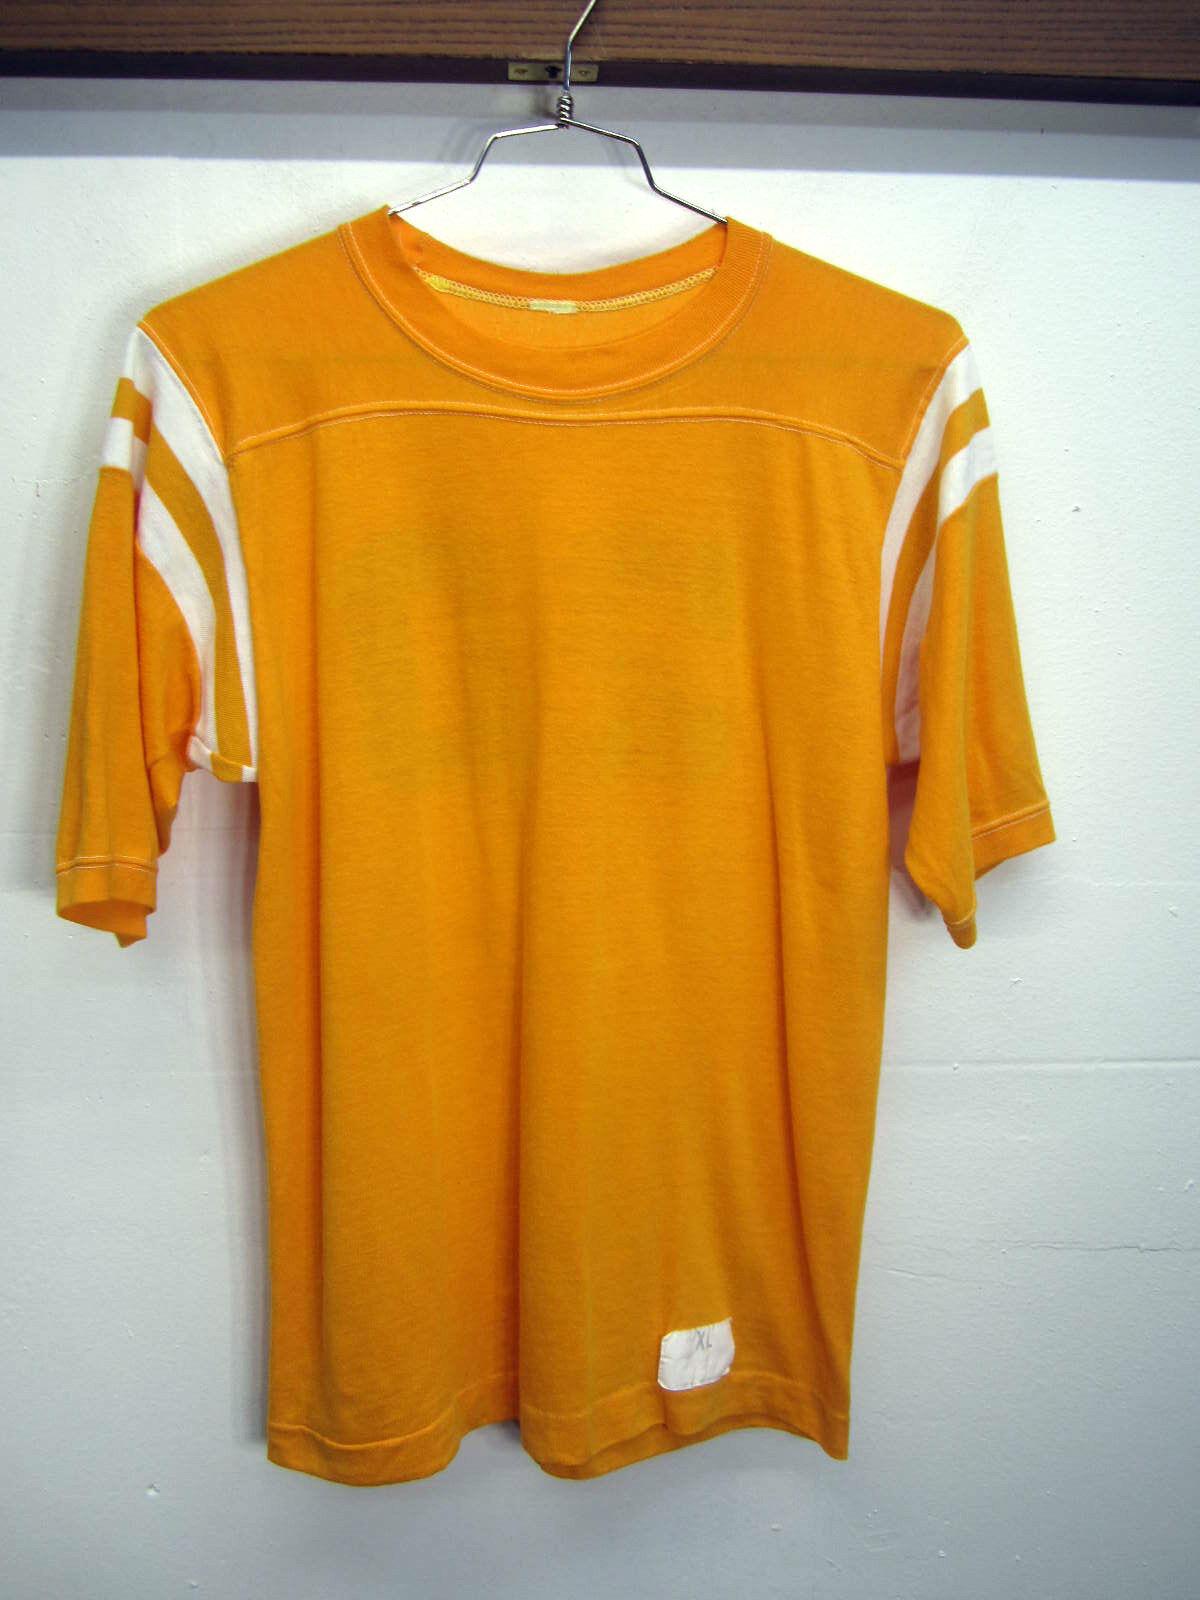 Vtg Champion Jersey retro Gelb polycotton 1/2 sleeve  20 sz XL made in USA